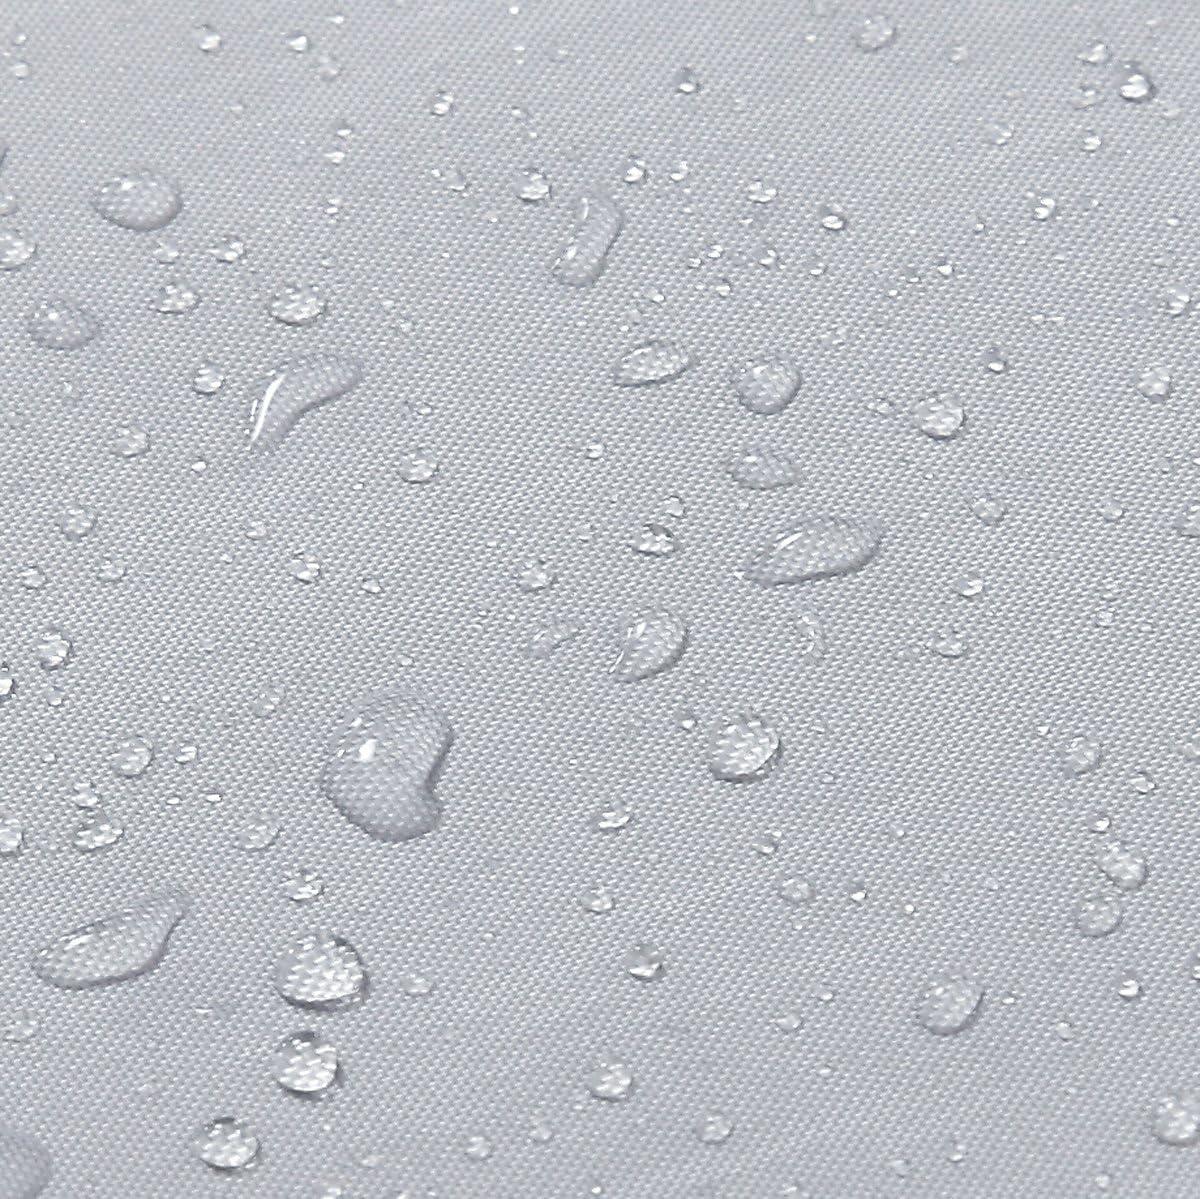 Cuarto de ba/ño Impermeable Cortina de Ducha impermeable P/úrpura 120x200